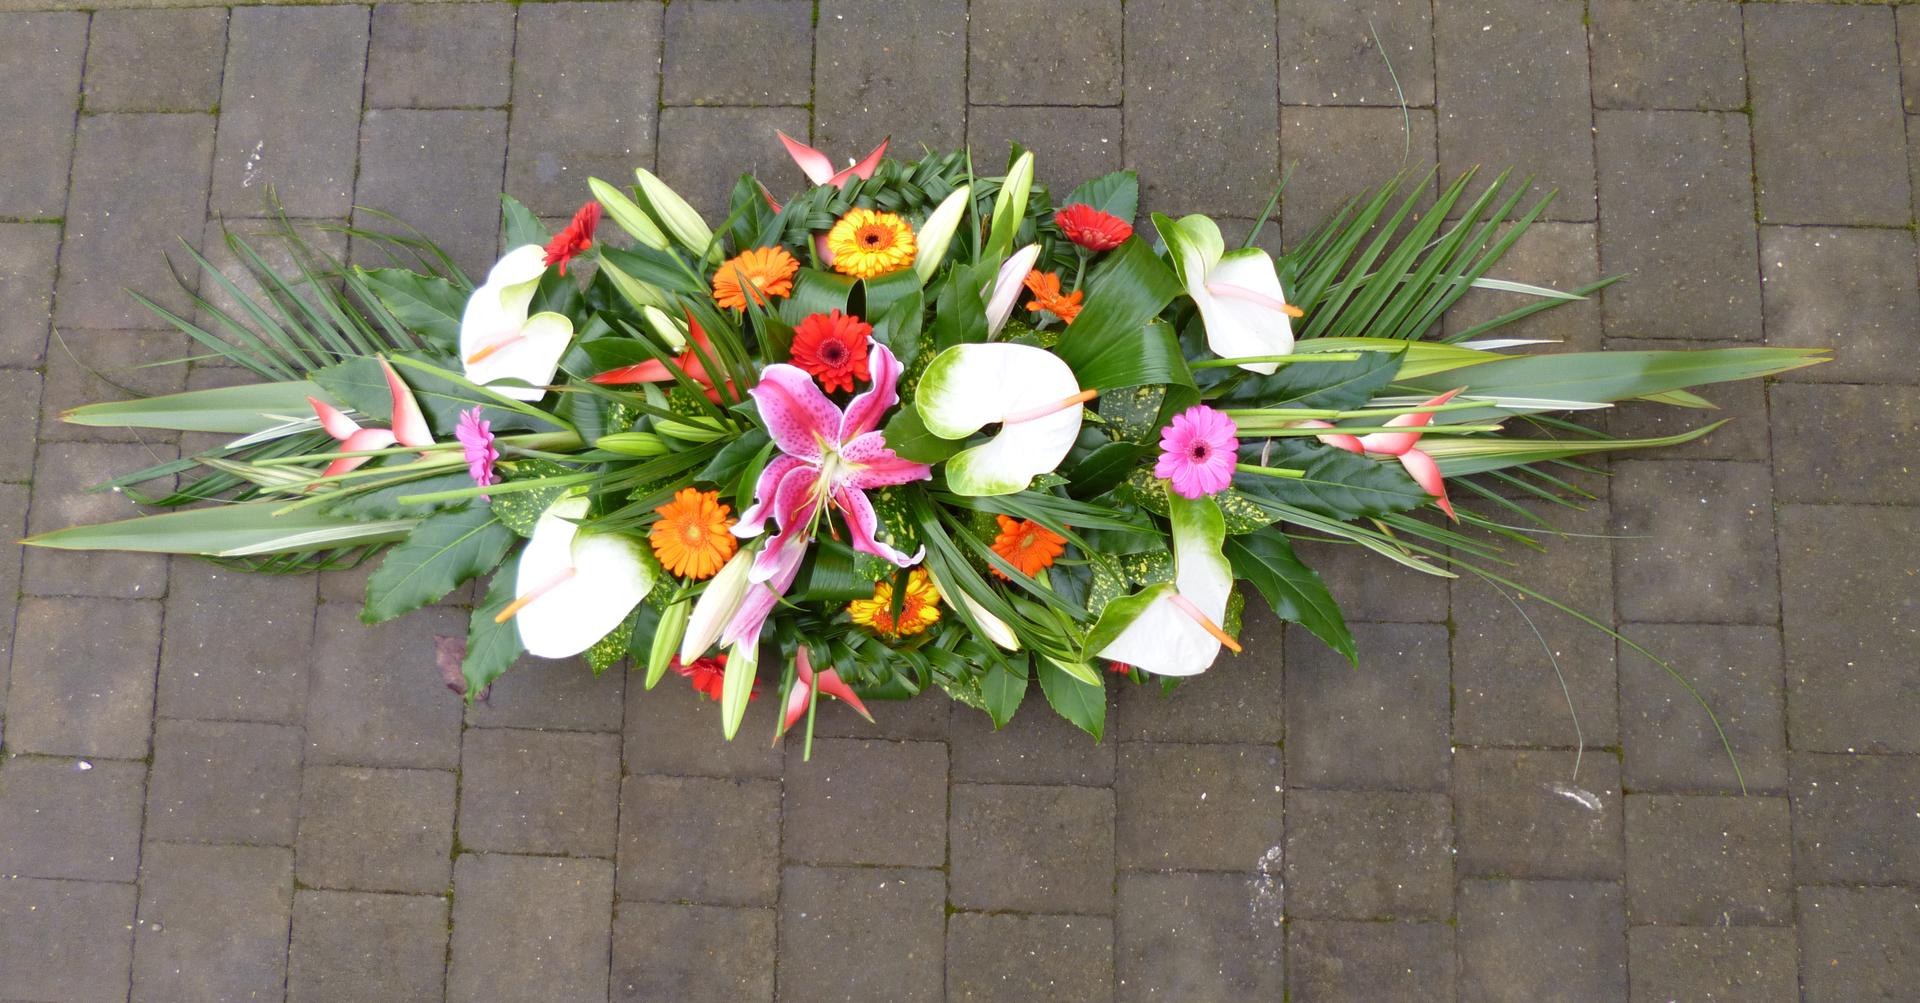 Bespoke funeral flowers thanks ever so much for the funeral flowers they looked lovely on the day jodie hurd april 2015 izmirmasajfo